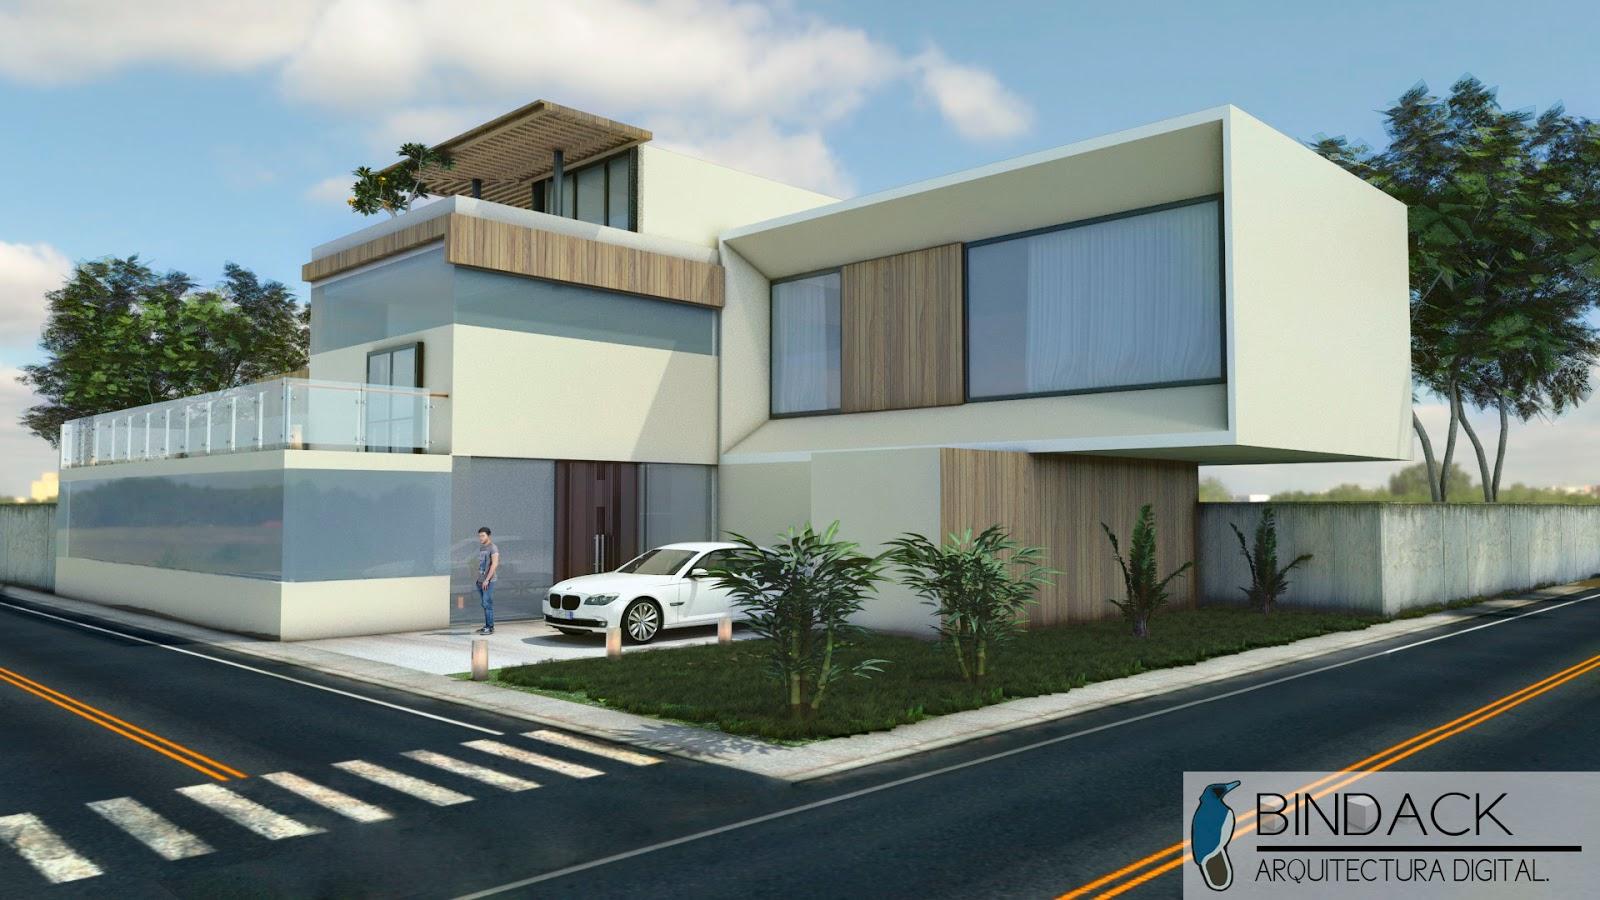 Bindack Arquitectura Digital Portafolio Casa New Deep